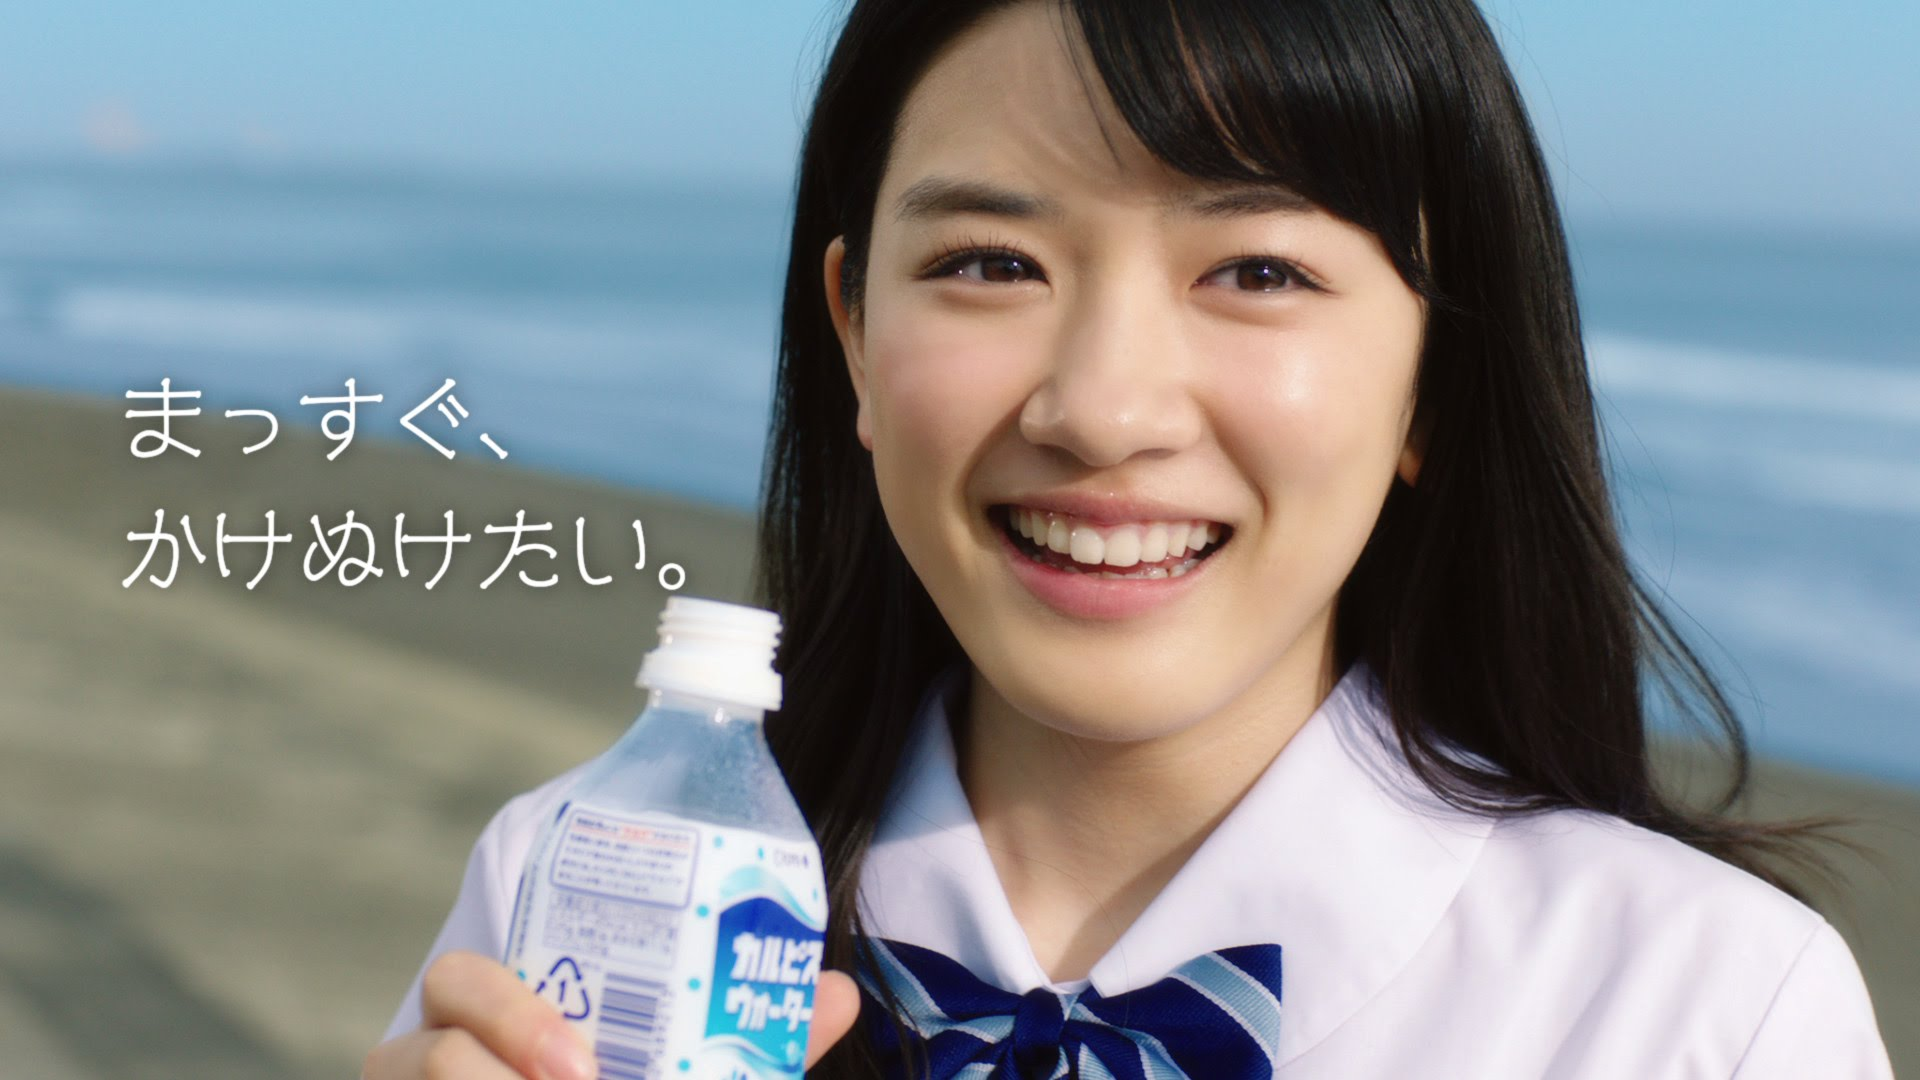 Mizutani Aoi